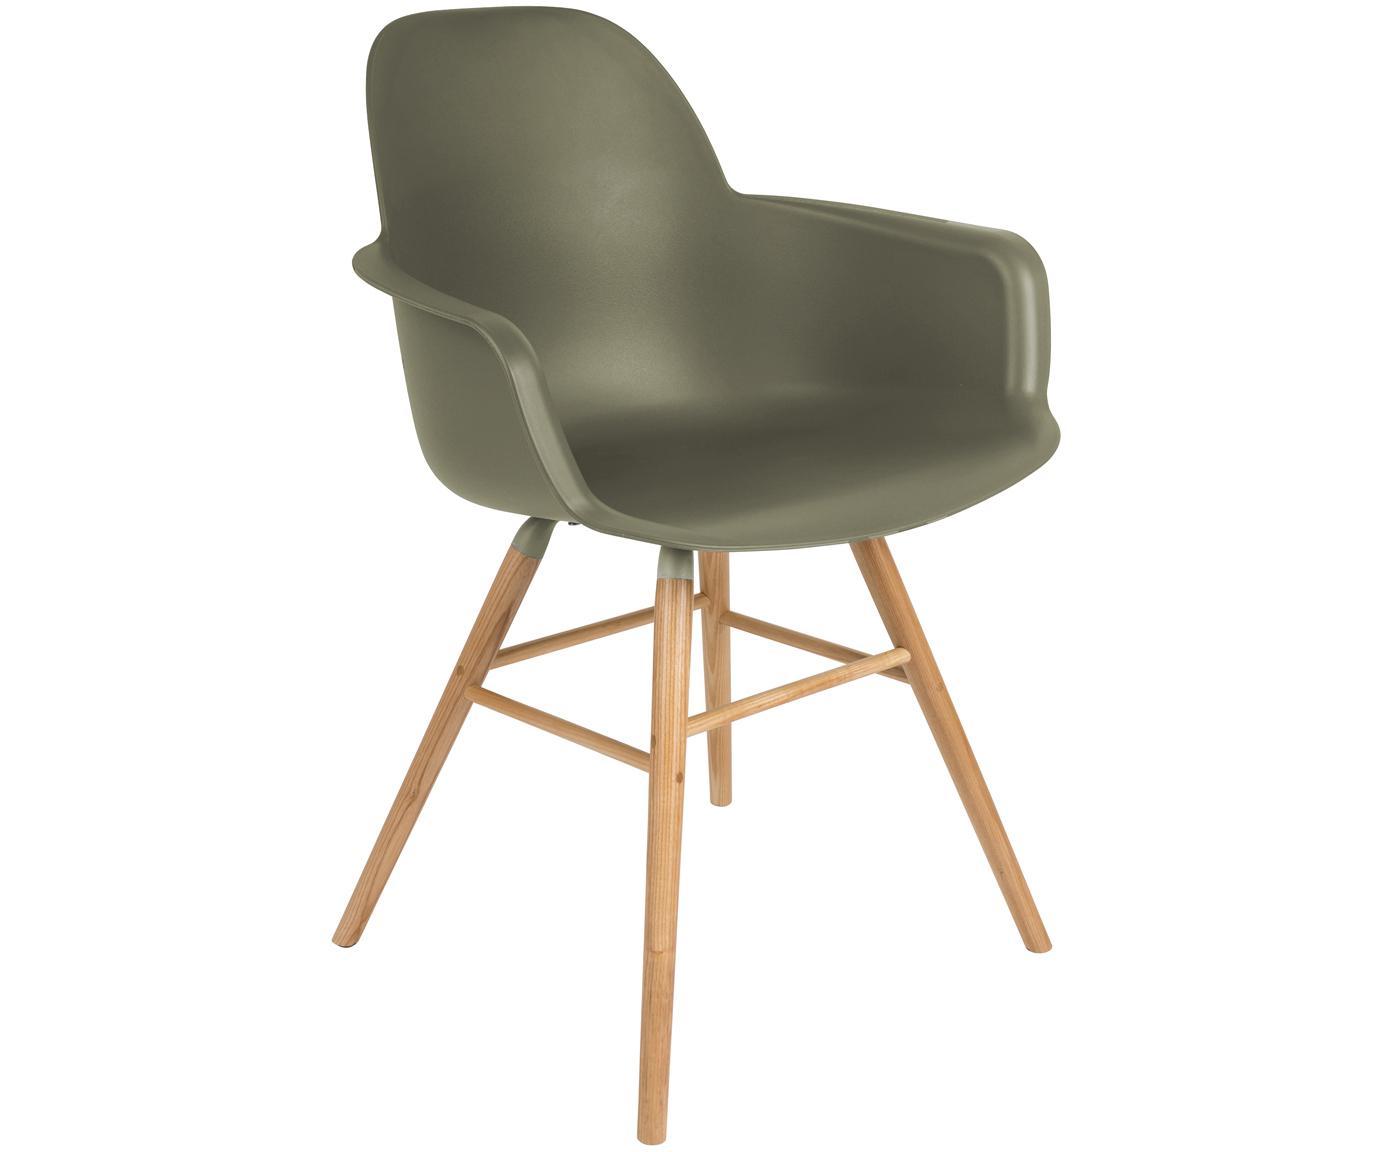 Sedia con braccioli Albert Kuip, Seduta: polipropilene, Gambe: legno di frassino, Verde, Larg. 59 x Prof. 55 cm